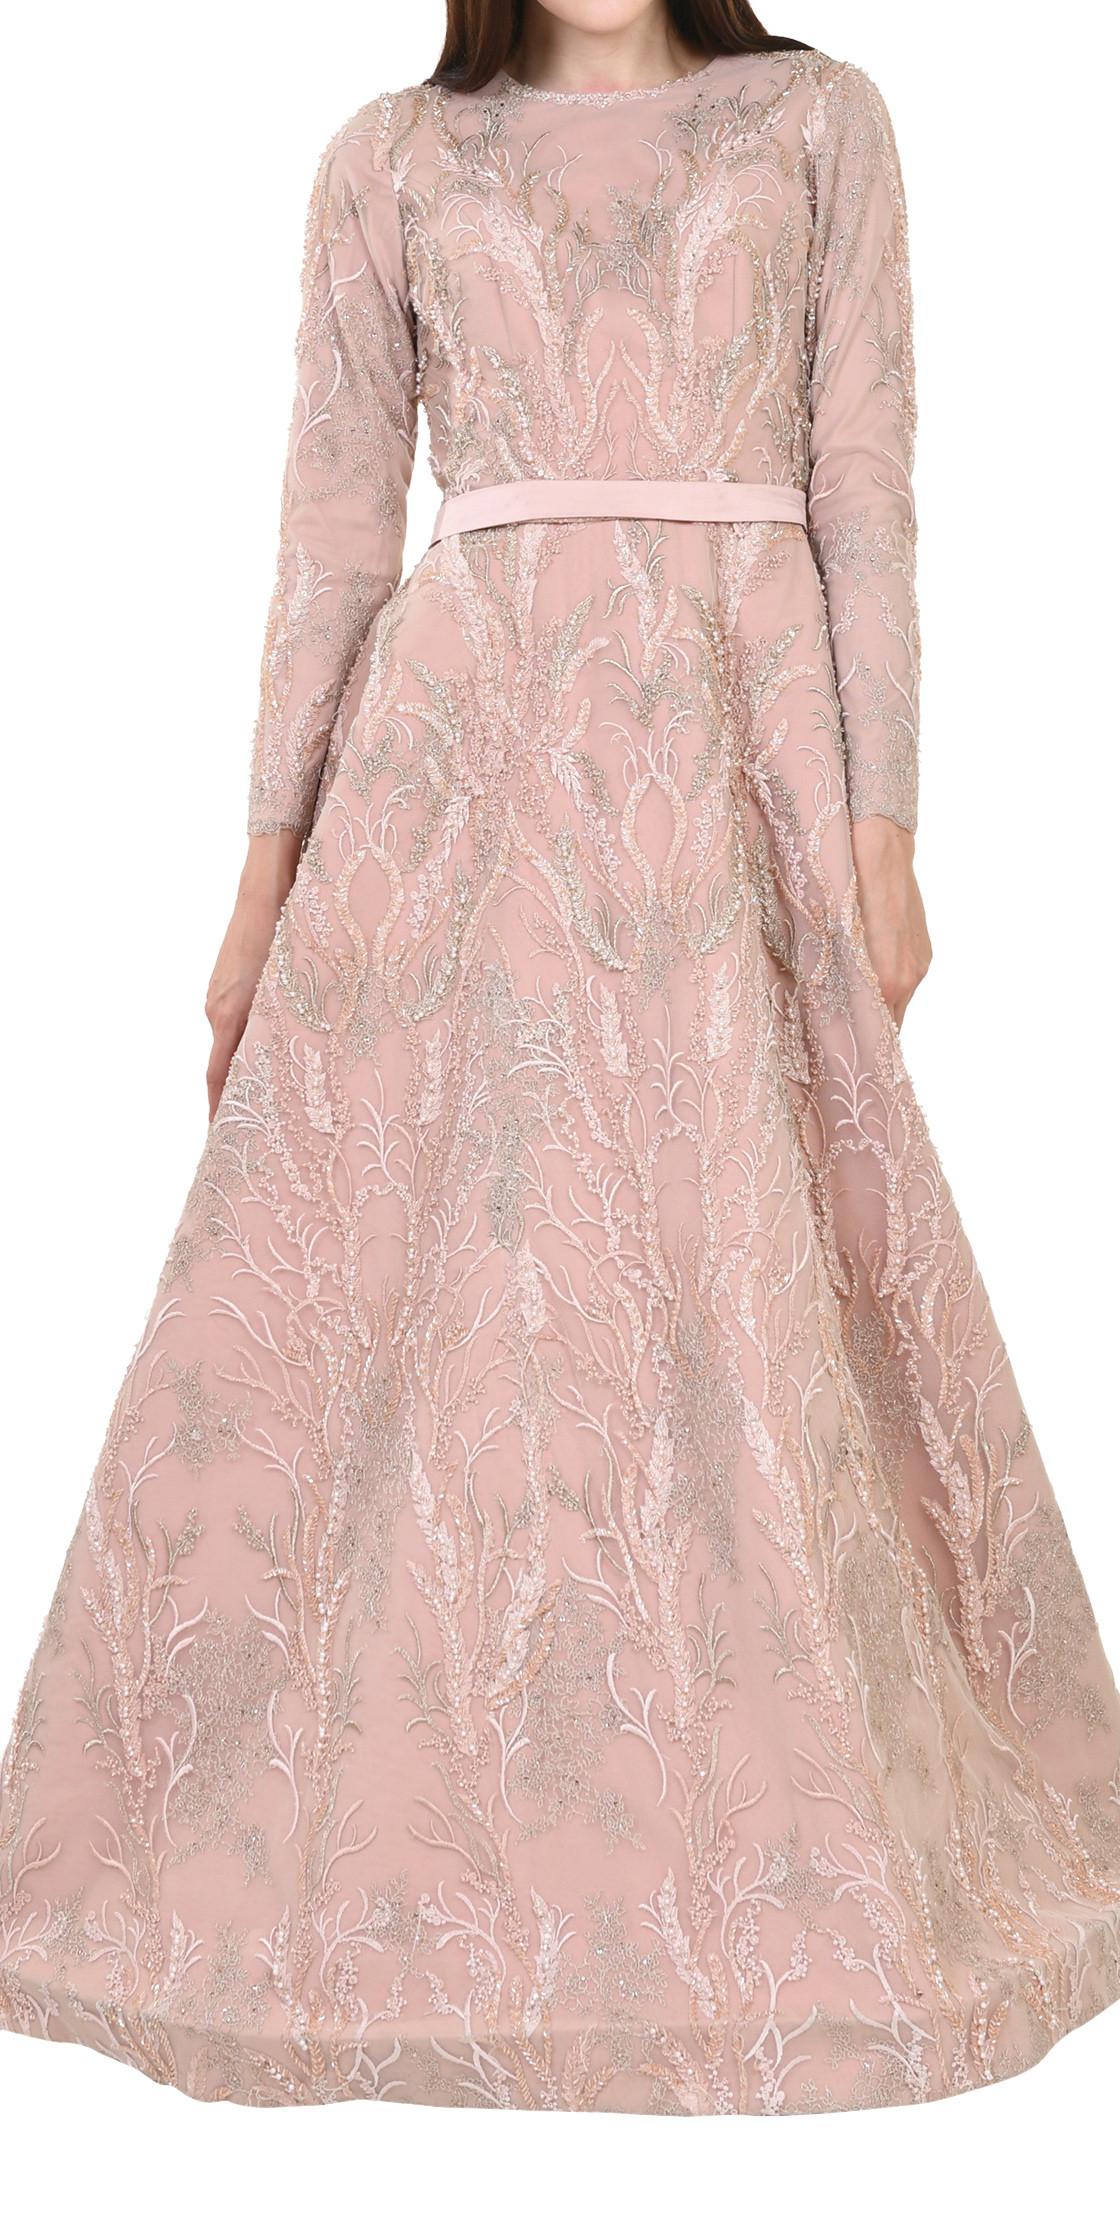 Anas El Rafieh A-Line Ballgown   Evening Dress Rental   Lebanon Rent ...